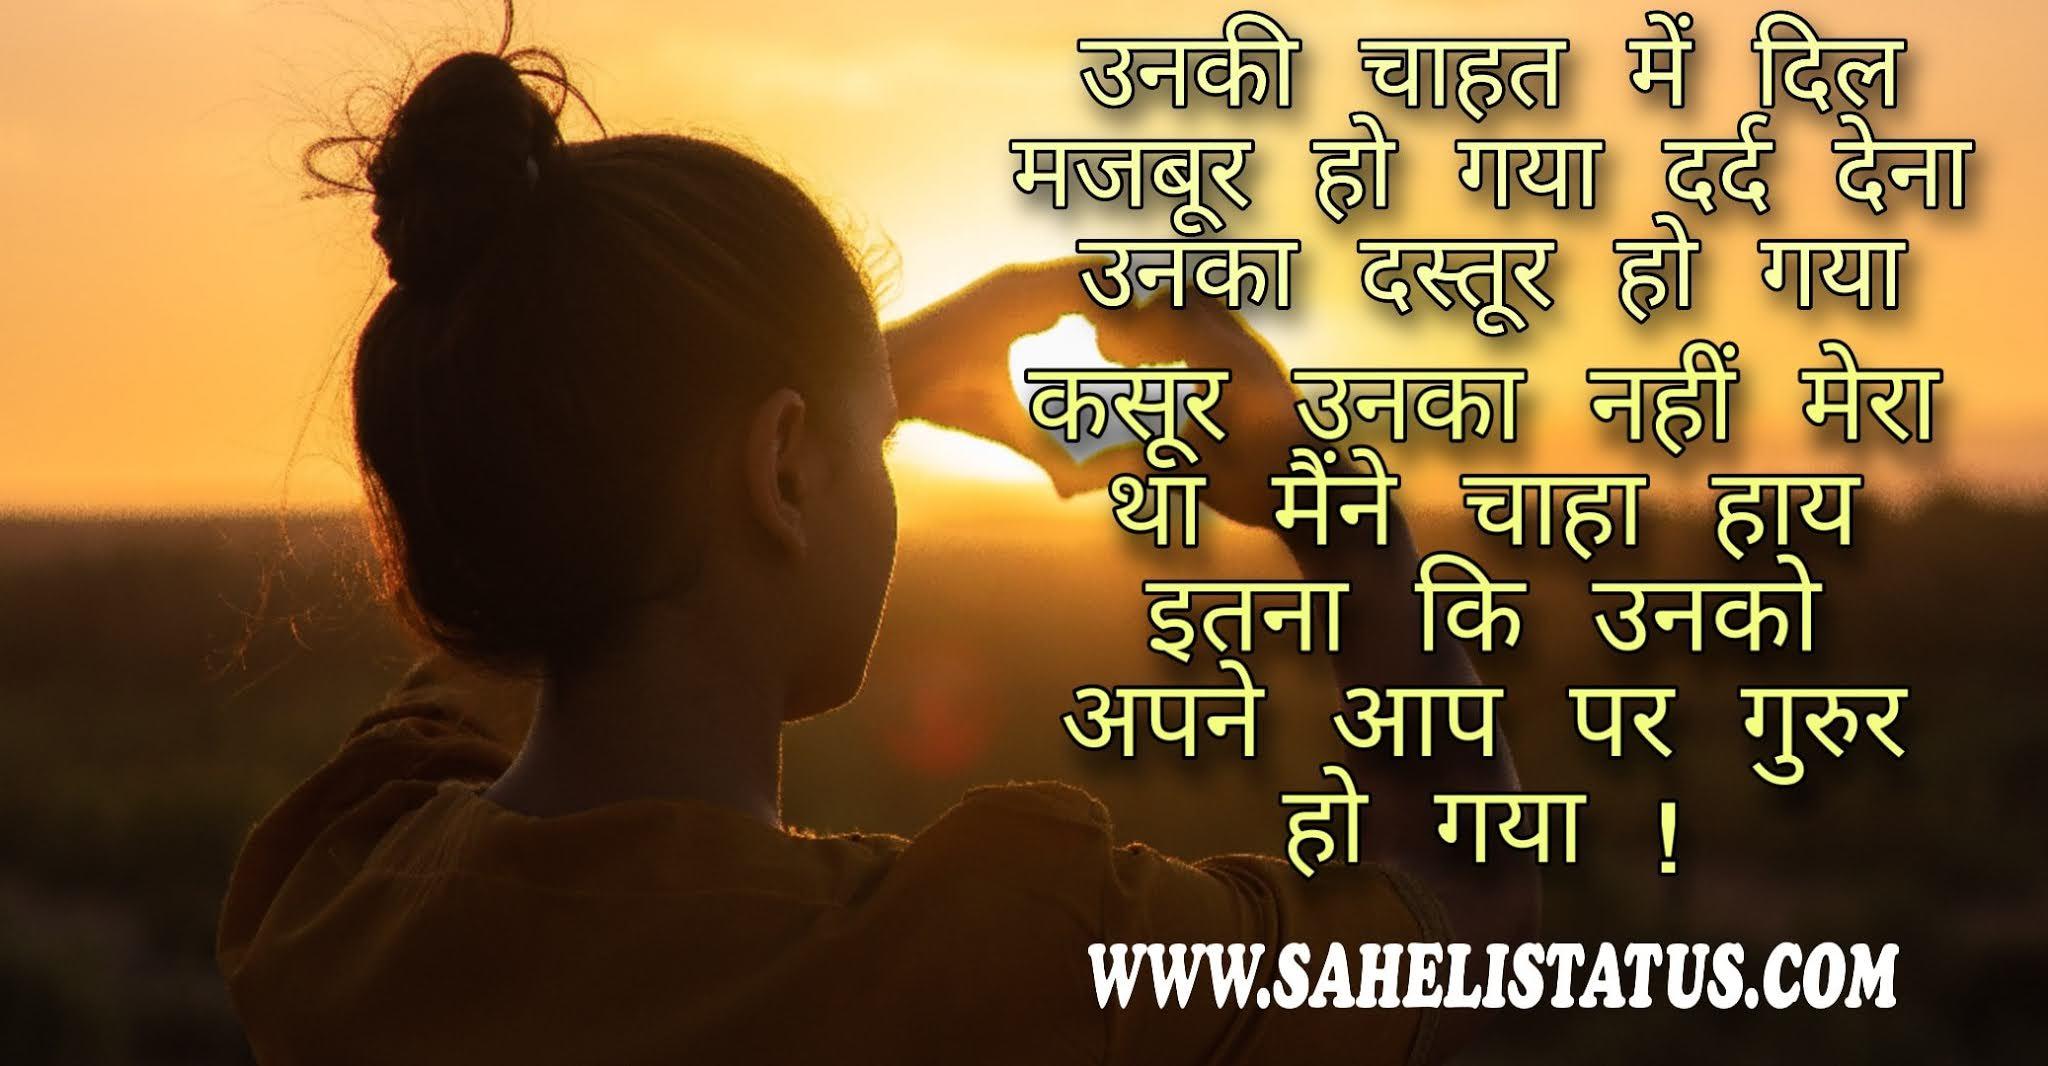 Best sad shayari in hindi on love